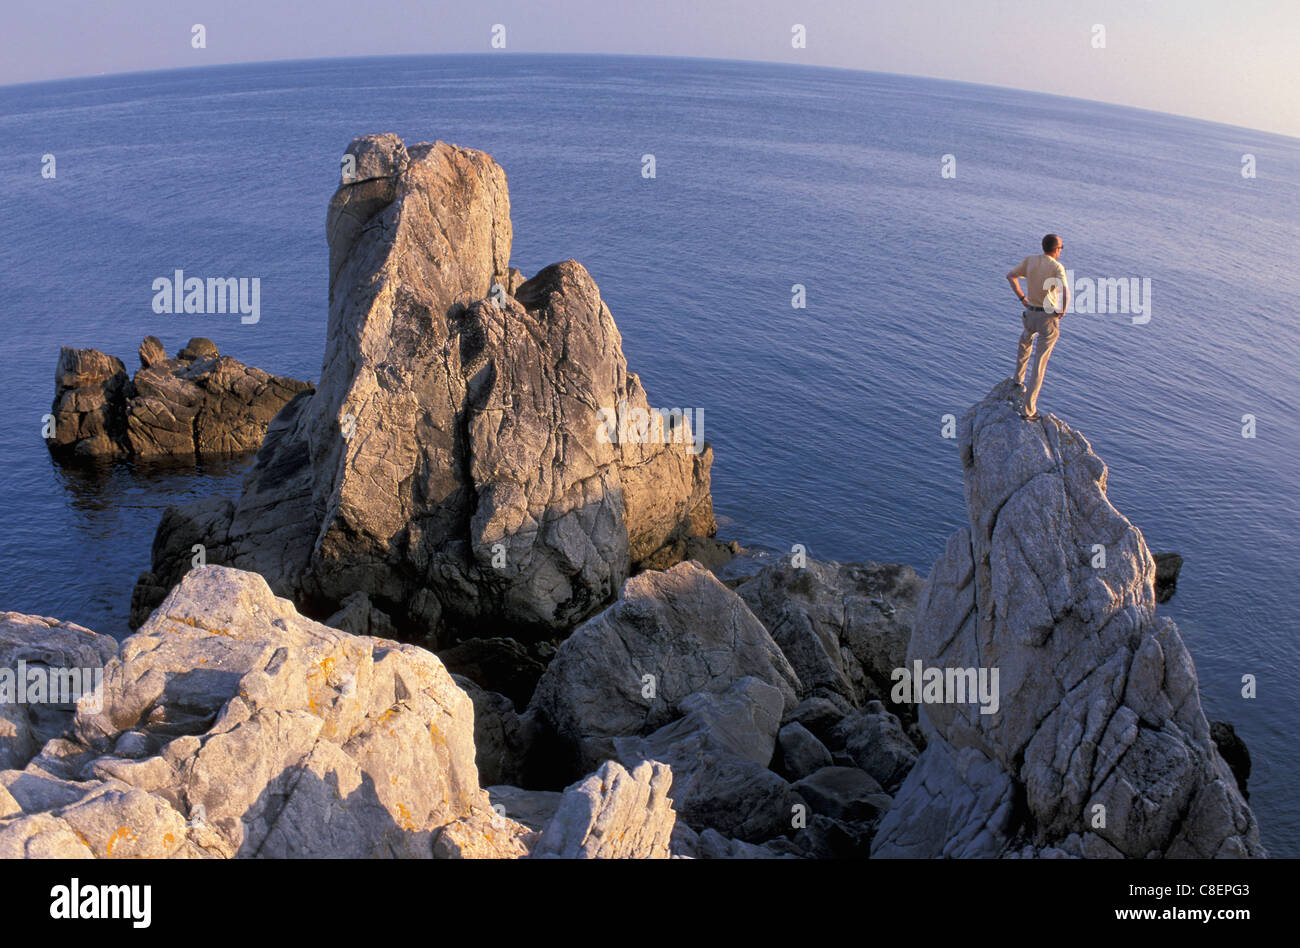 Coast, near Le Croisic, Brittany, France, Europe, rocks, sea, person Stock Photo